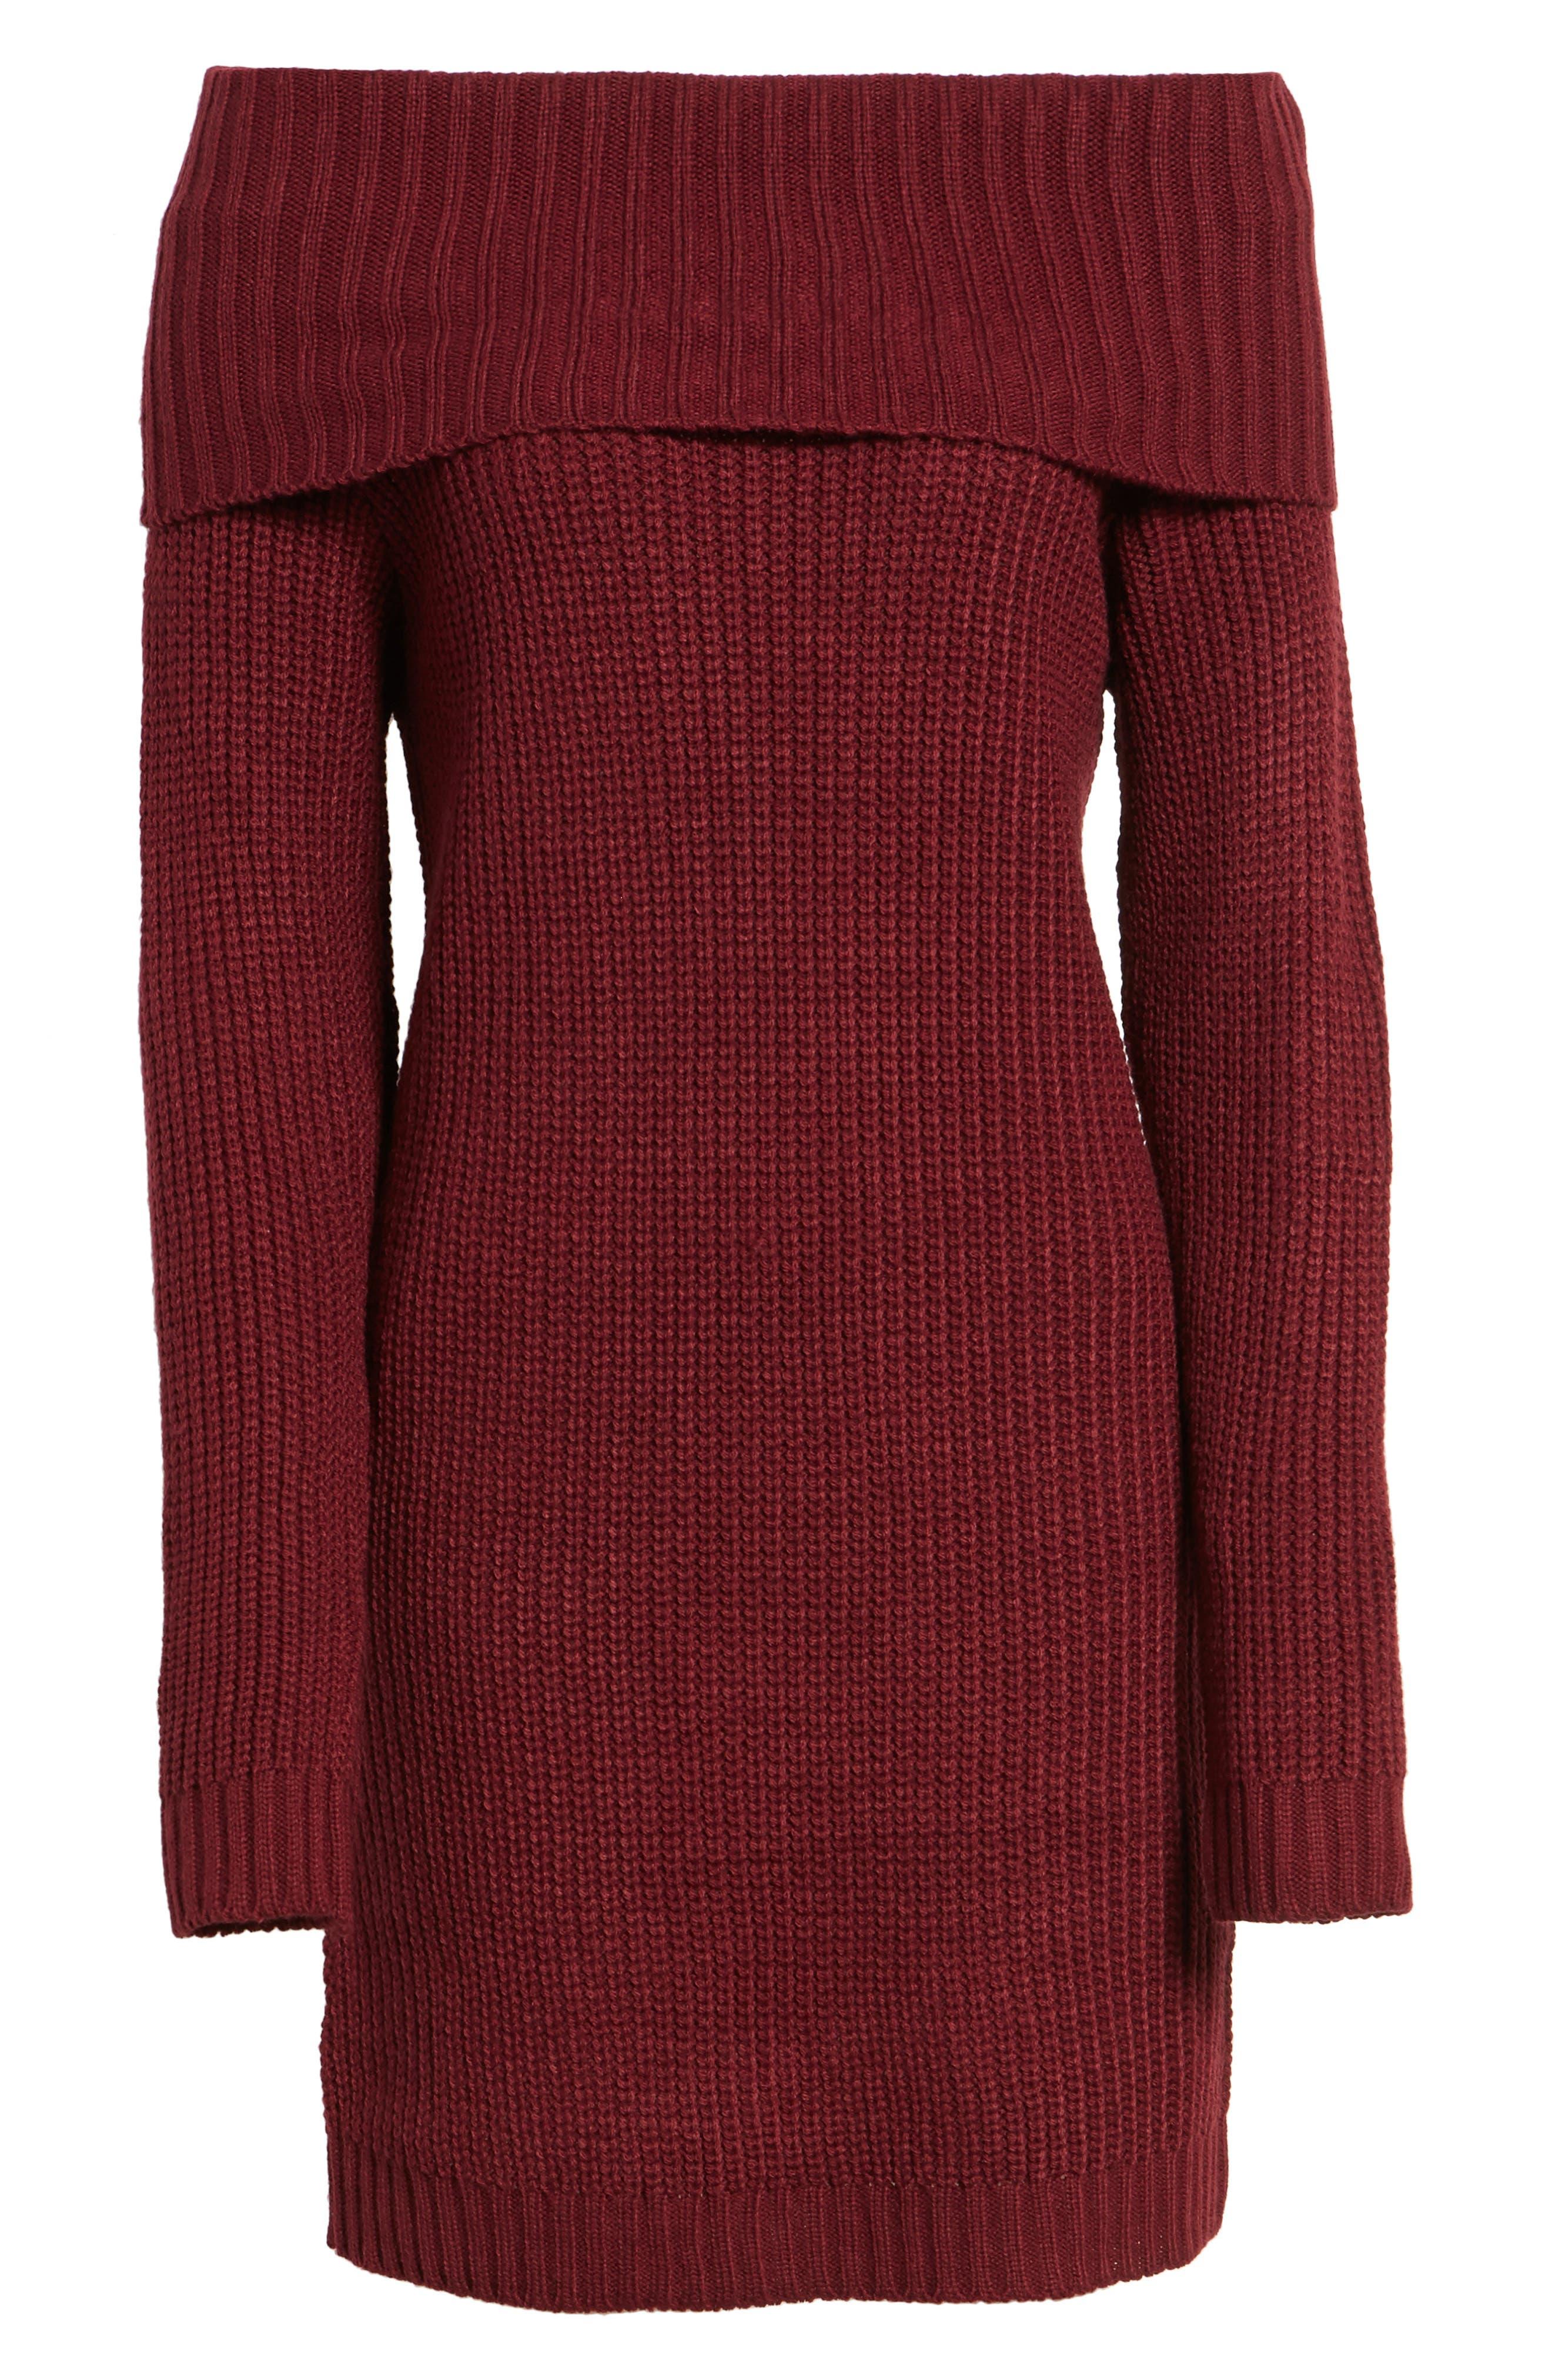 Foldover Off the Shoulder Sweater Dress,                             Alternate thumbnail 24, color,